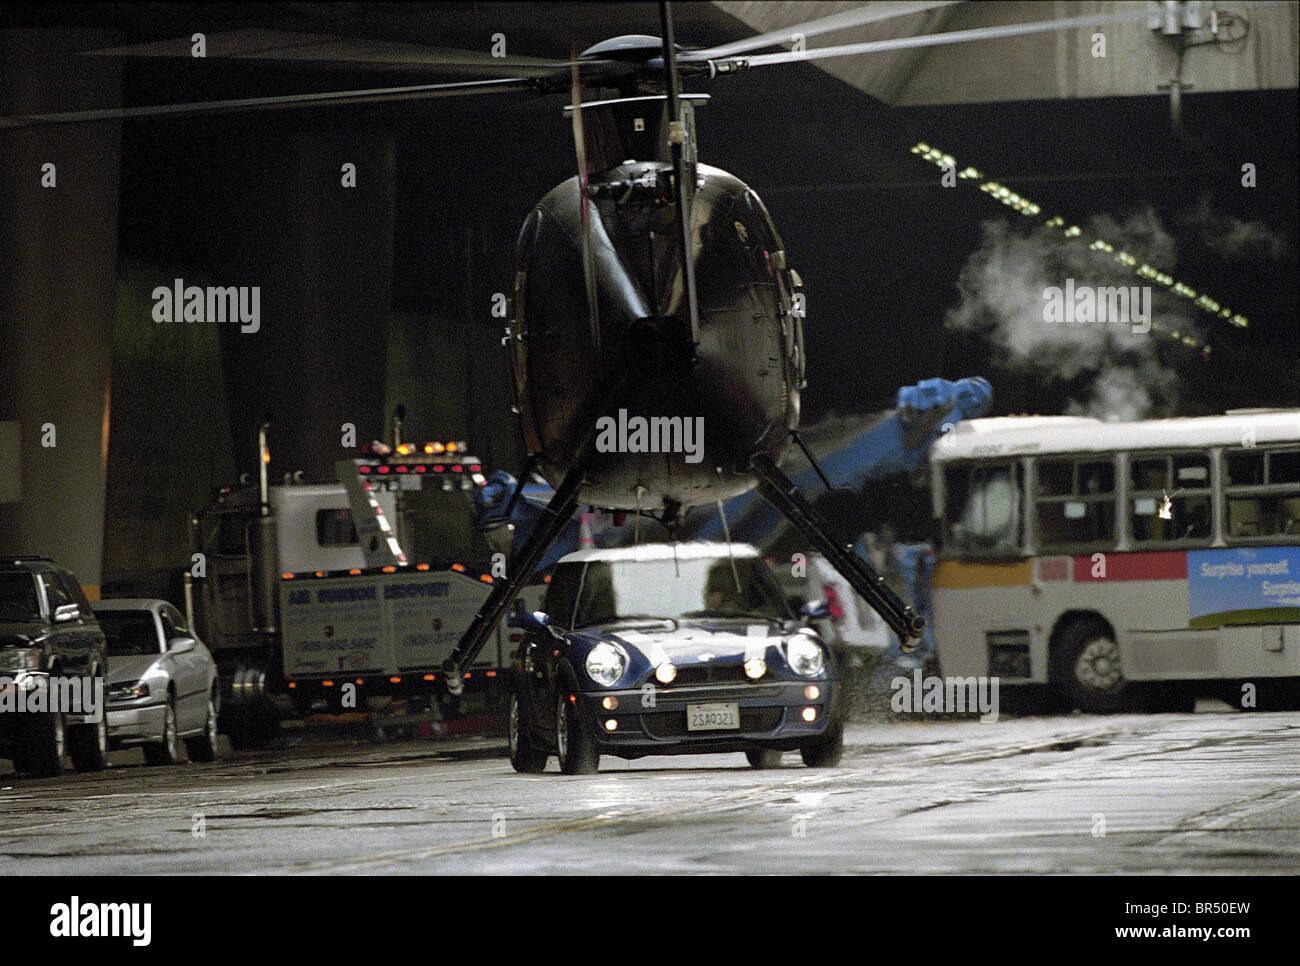 HELICOPTER & MINI CAR THE ITALIAN JOB (2003) - Stock Image